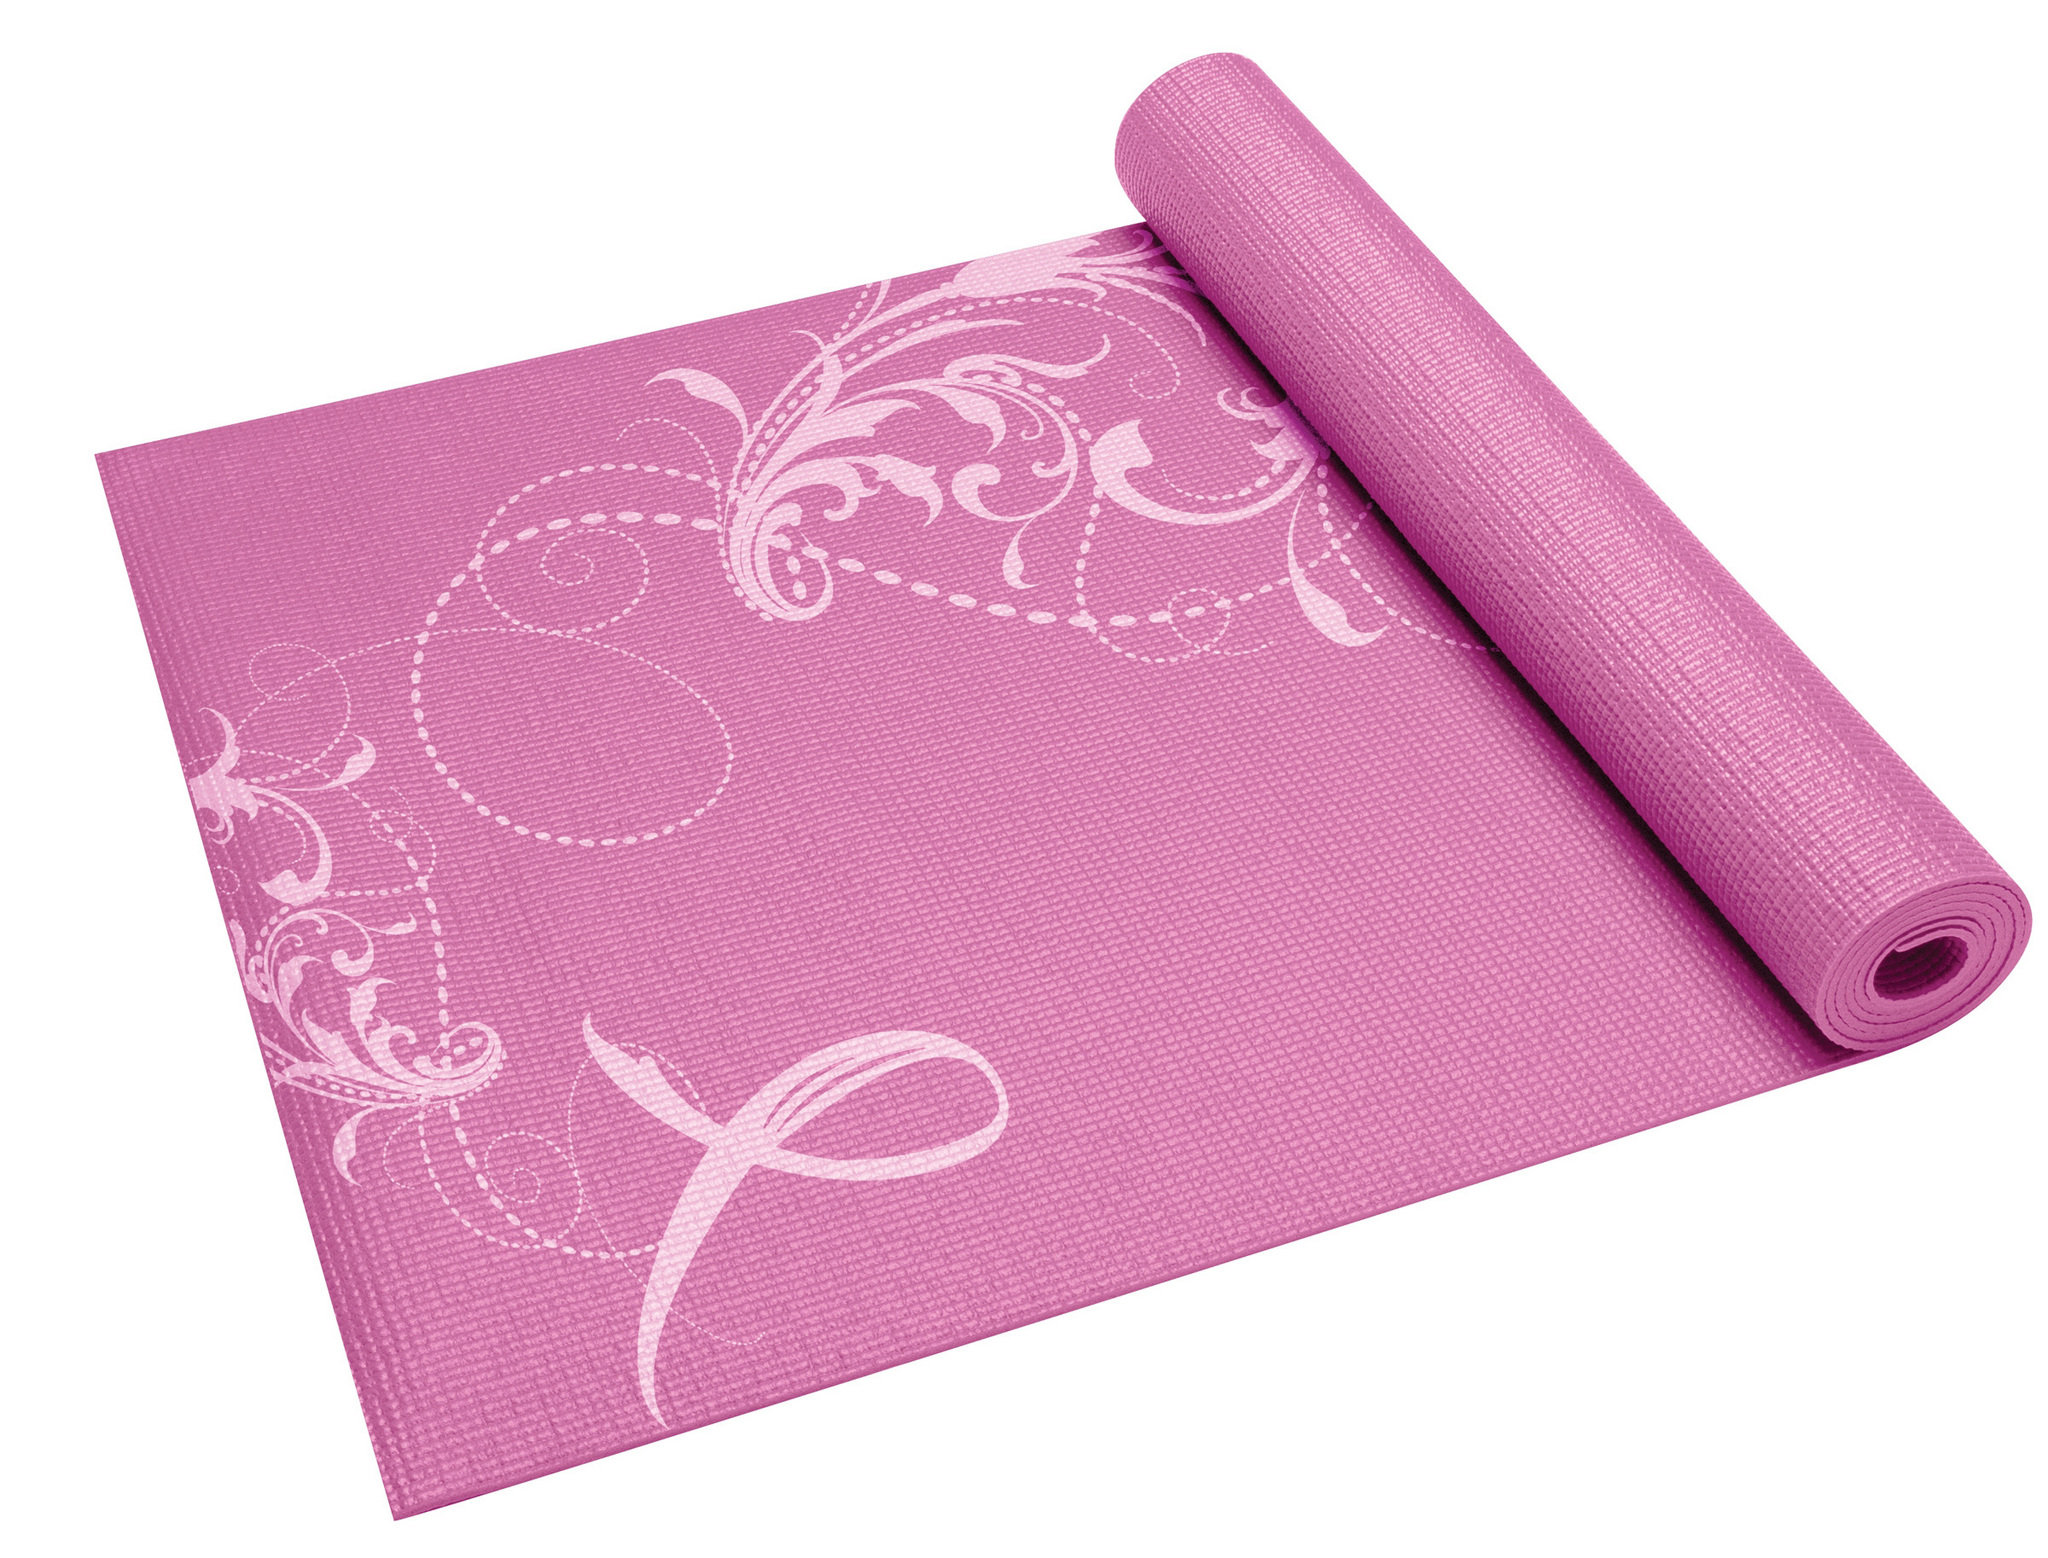 Breast cancer mat